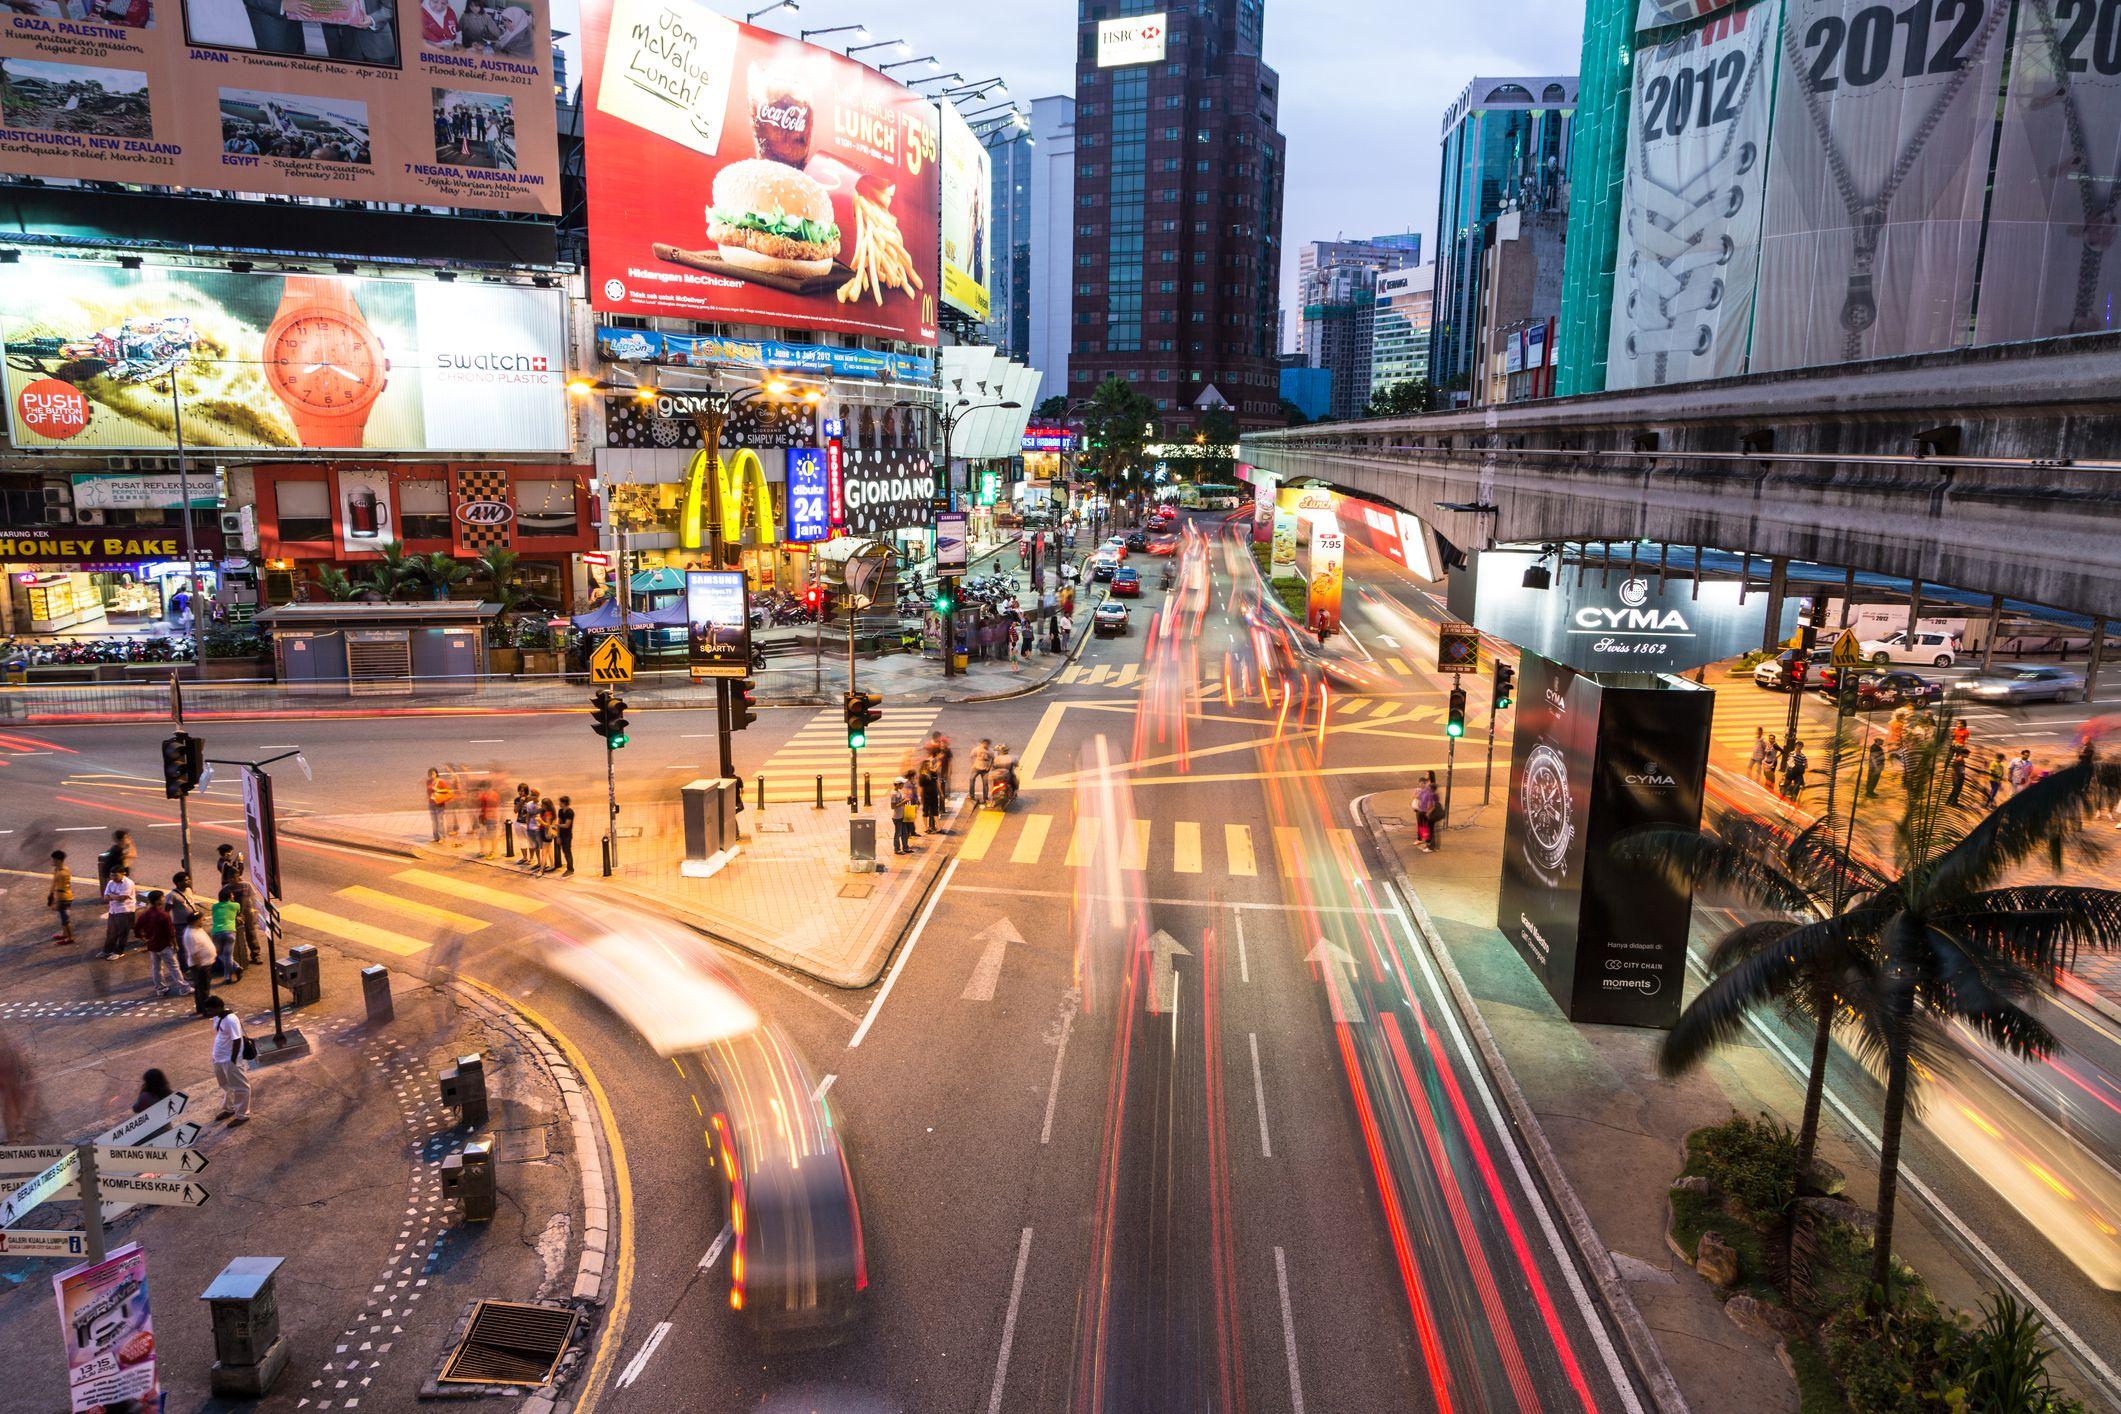 Cars rush at night through the Bukit Bintang intersection in the Kuala Lumpur City Center.